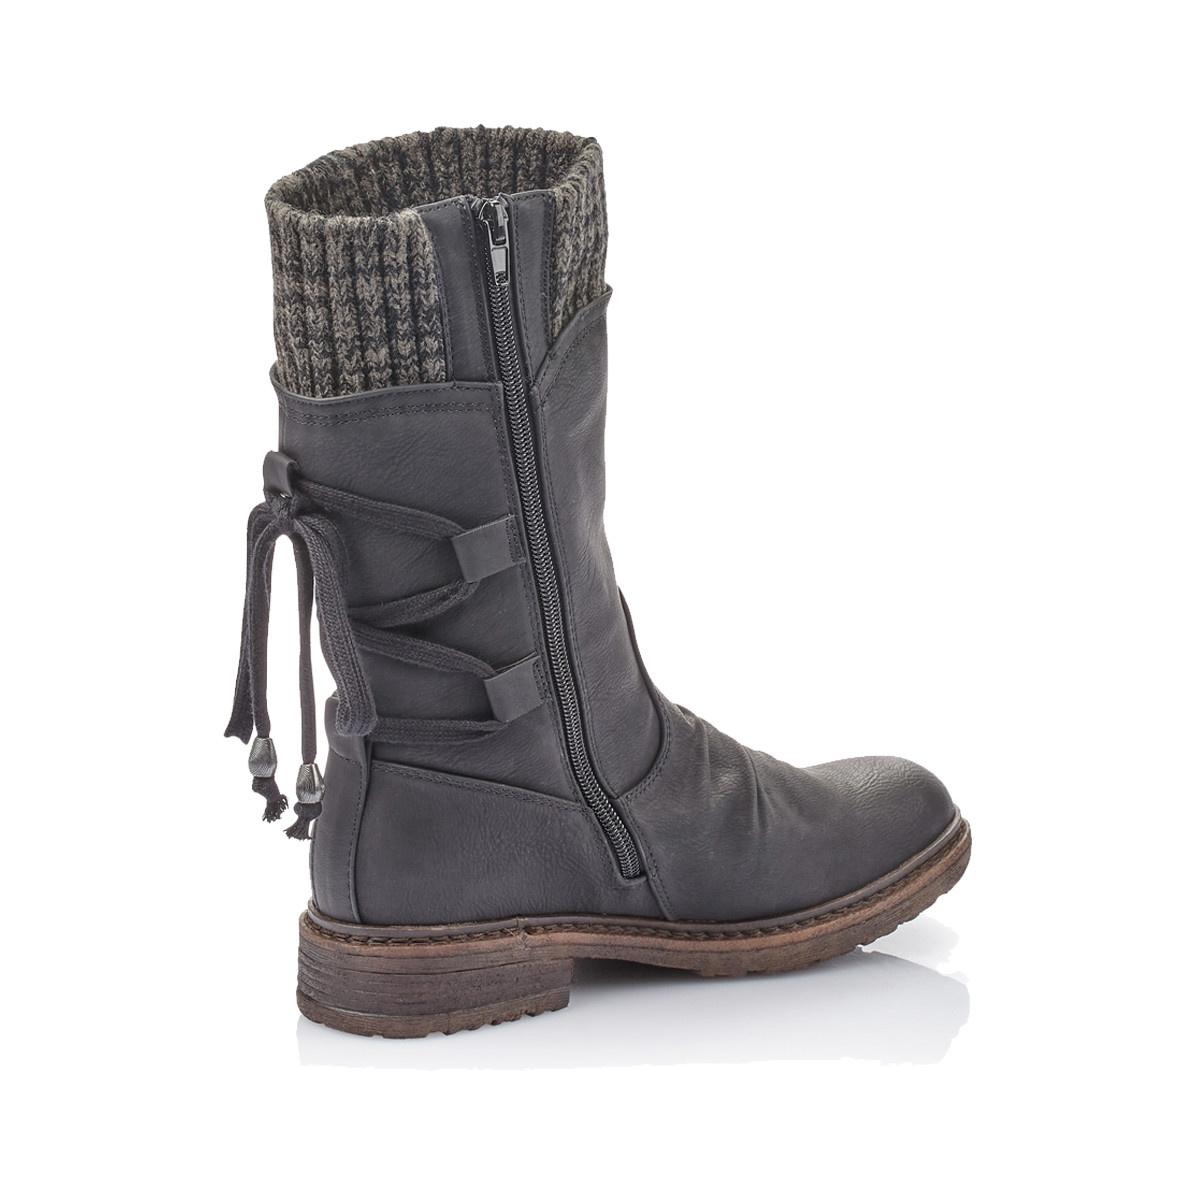 Rieker Rieker Women's Mid-Boot 94773-00 Black